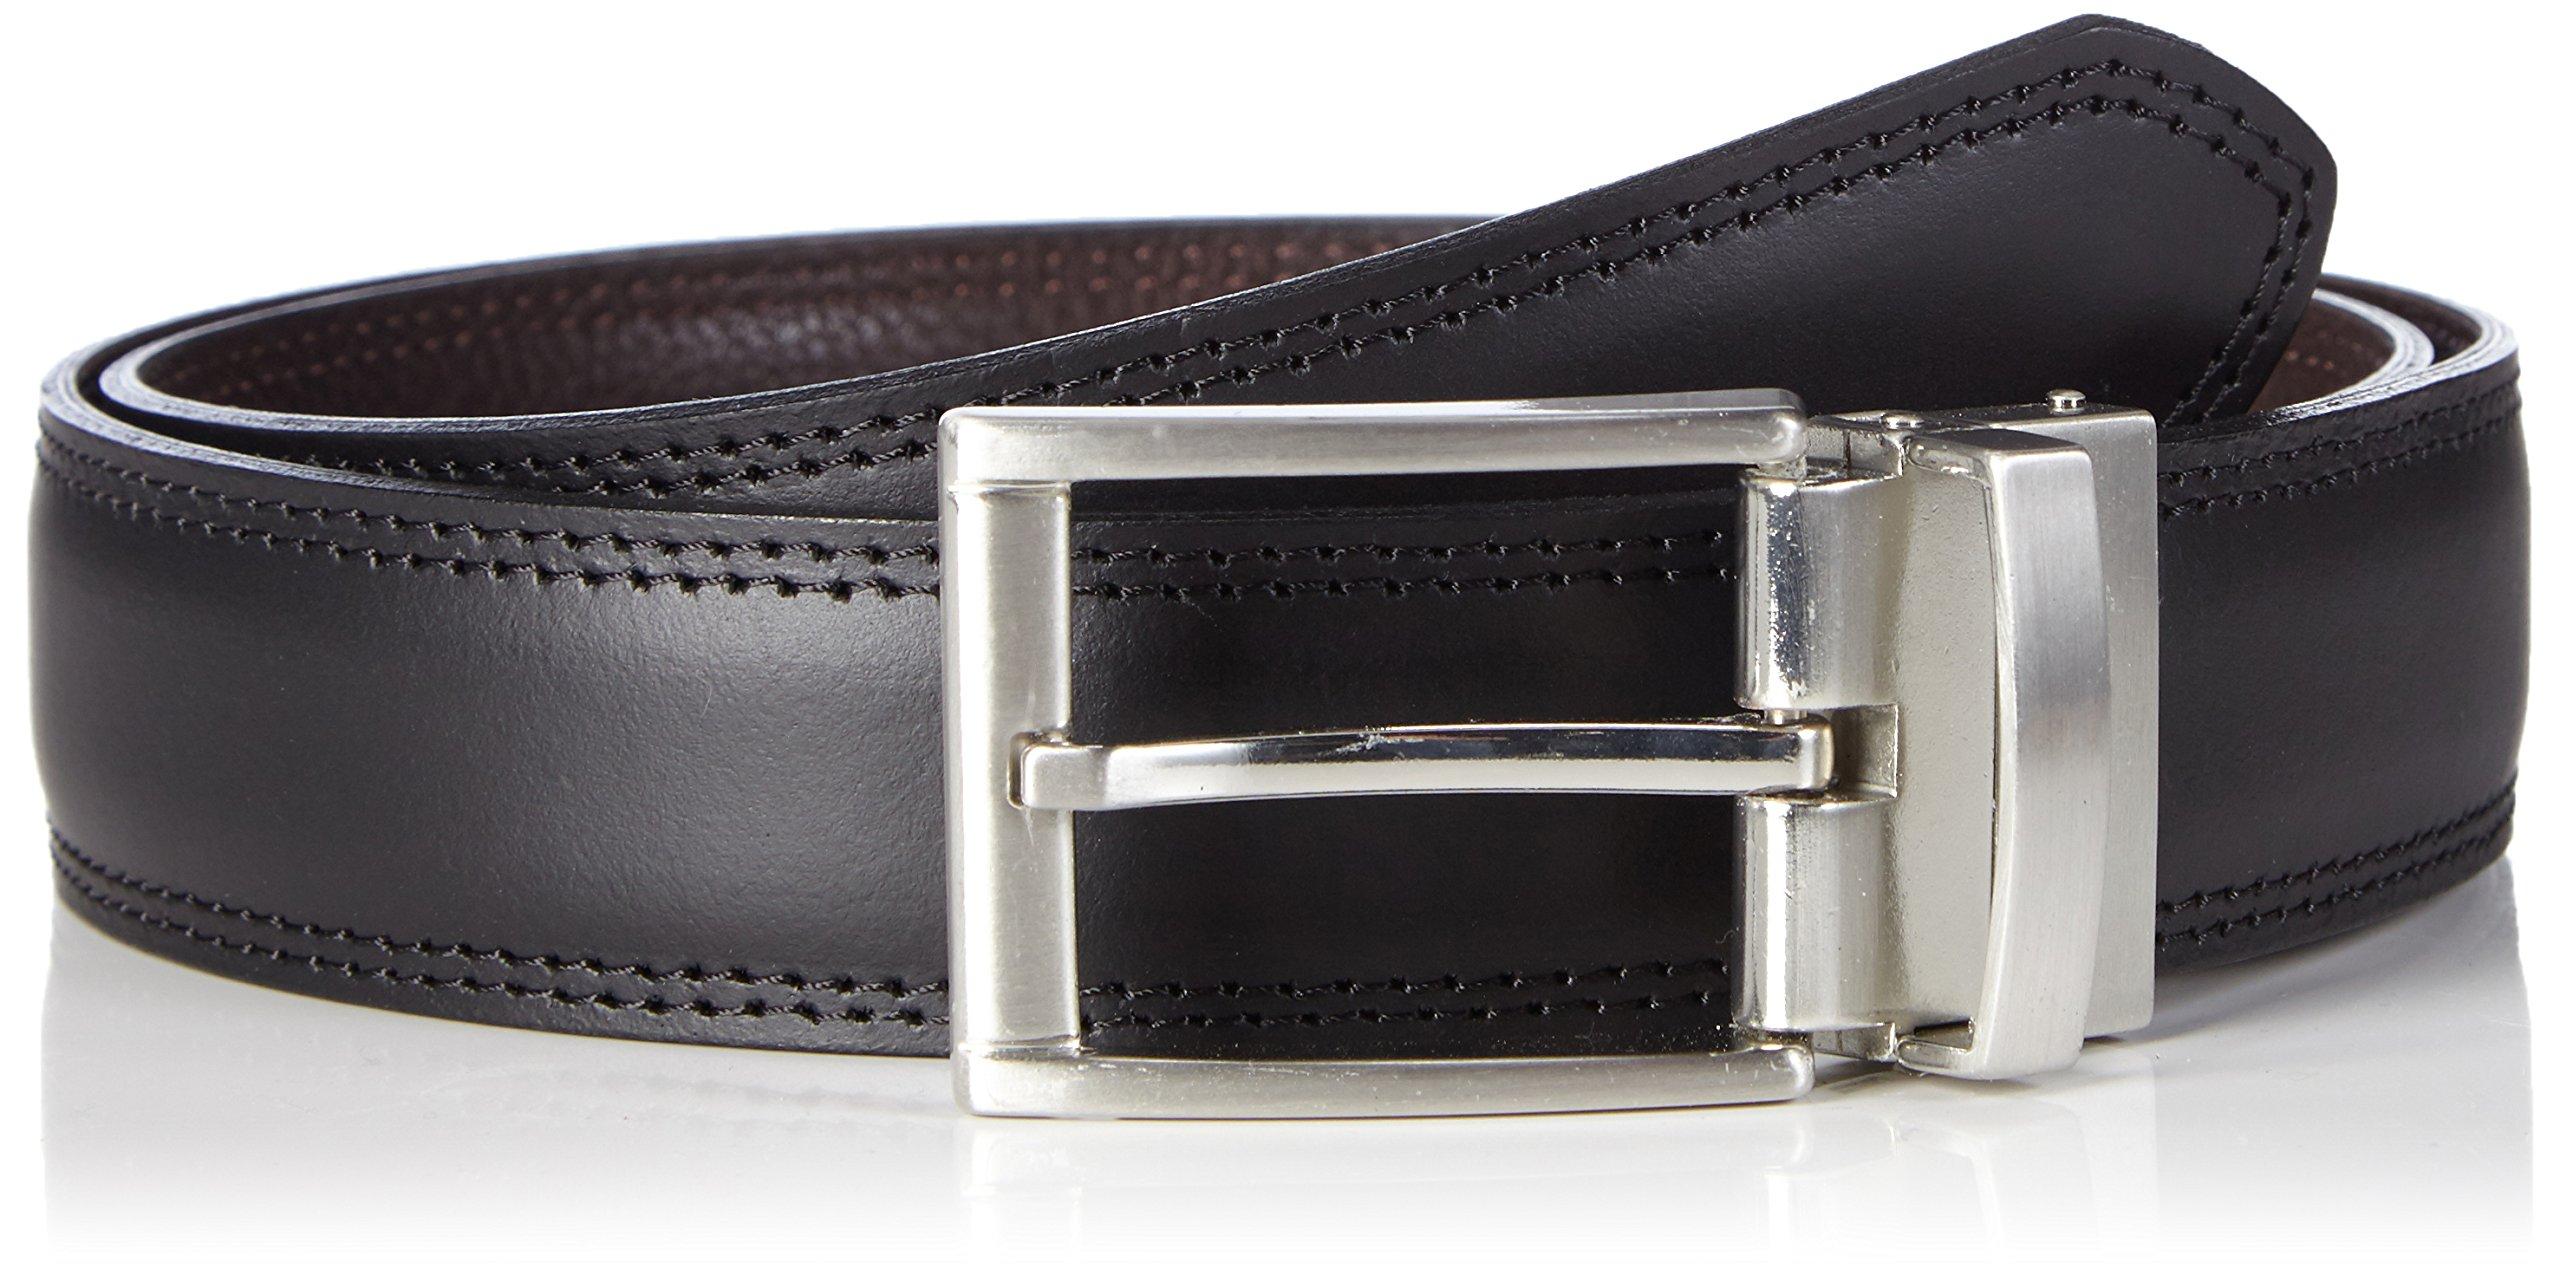 MLT Belts & Accessoires Milano – Cinturón Hombre